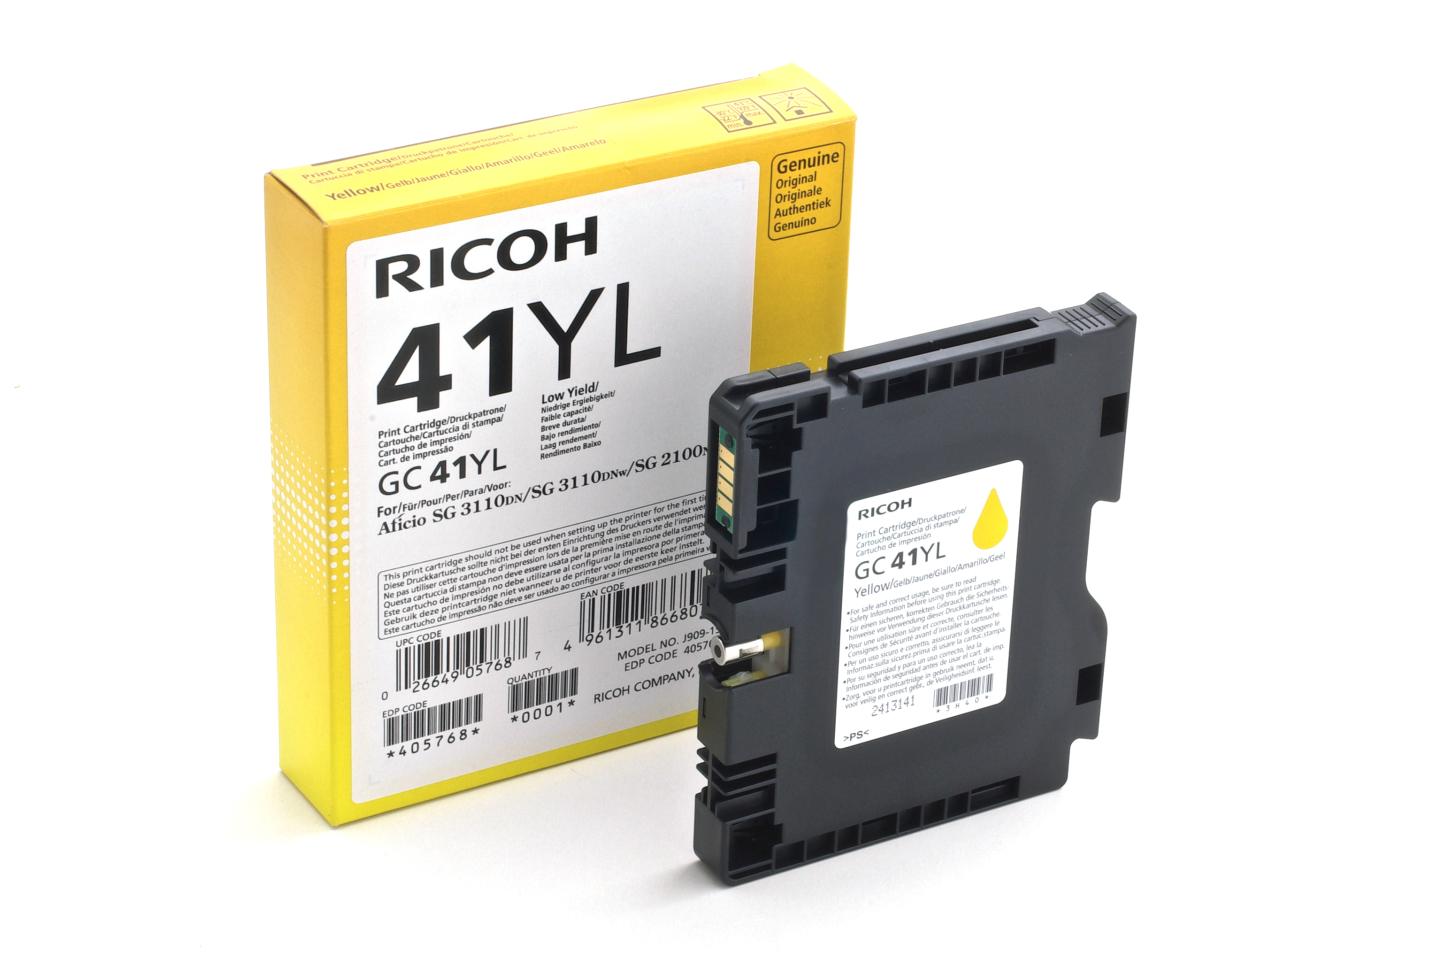 Ricoh - toner 405768 (SG 2100N, 3110DN, 3110DNw, 3100SNw, 3110SFNw, 3120B SFNw, 7100DN) 600 stran, žlutý